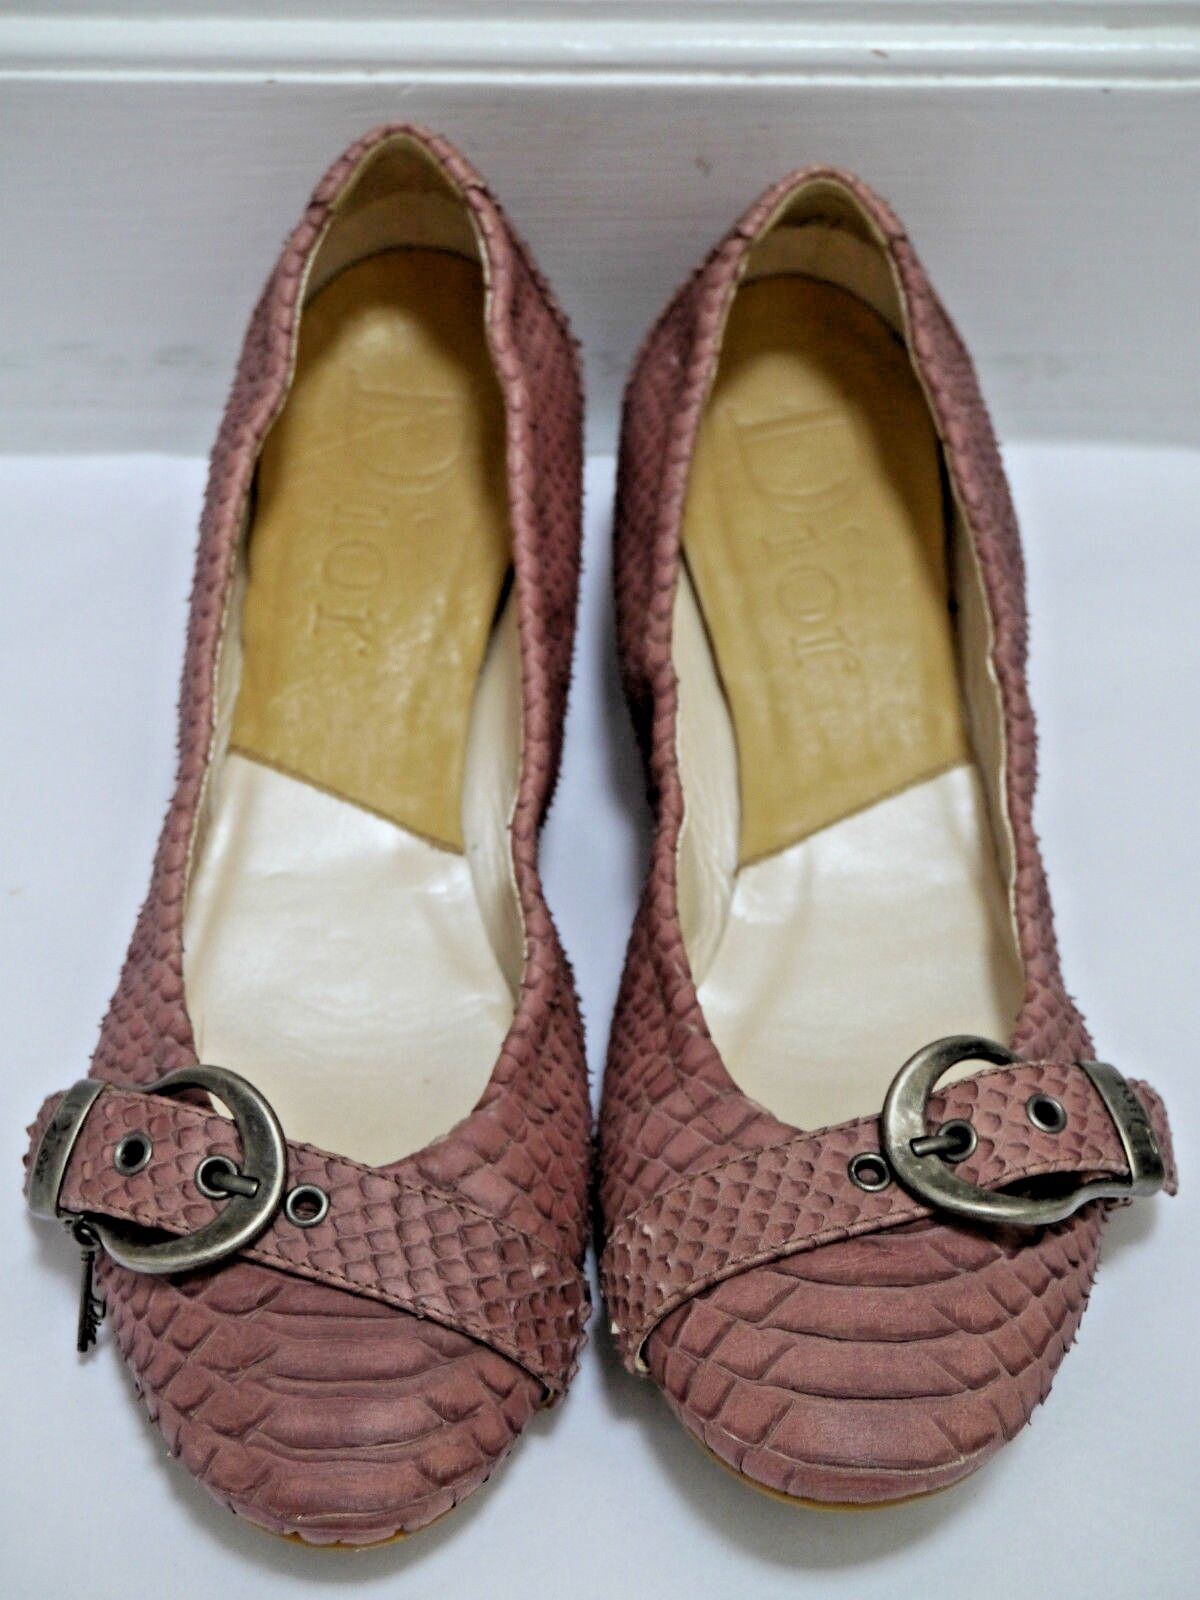 CHRISTIAN DIOR genuine python skin ballet flats shoes Italian size 39